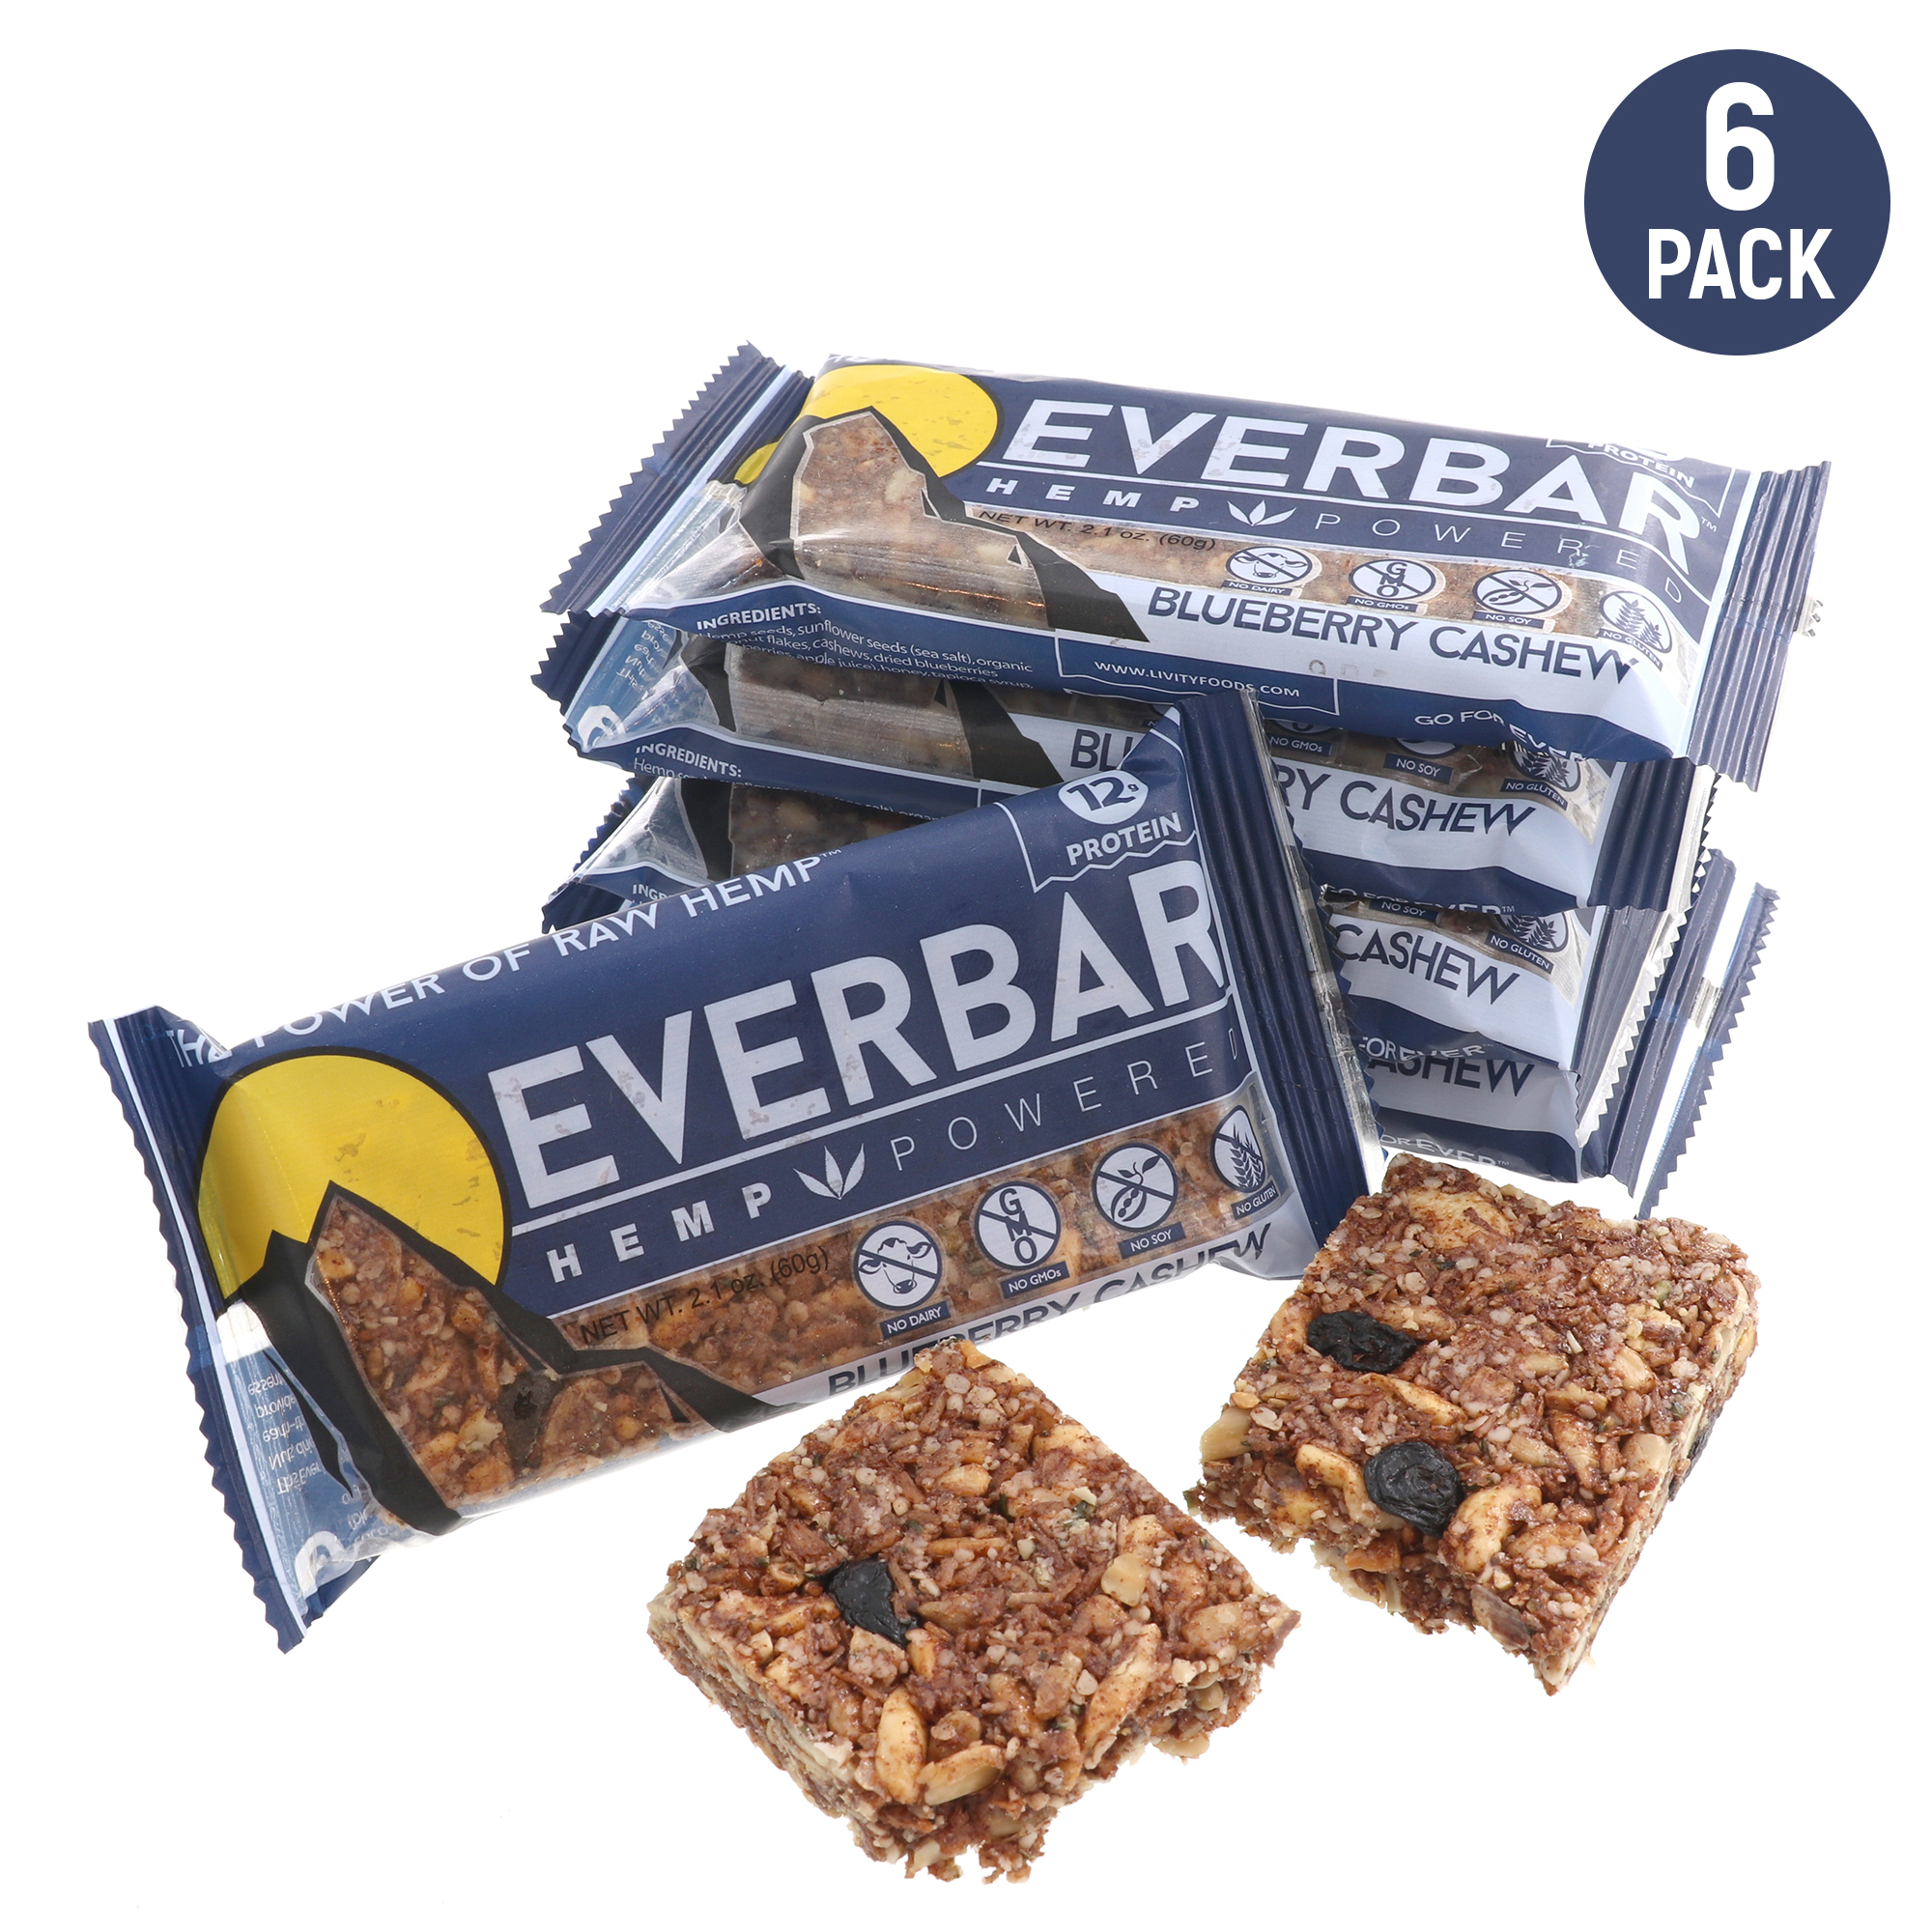 EverBar - Hemp Powered - 12g Protein Bars - Gluten-Free - Blueberry Cashew - 6 Pack